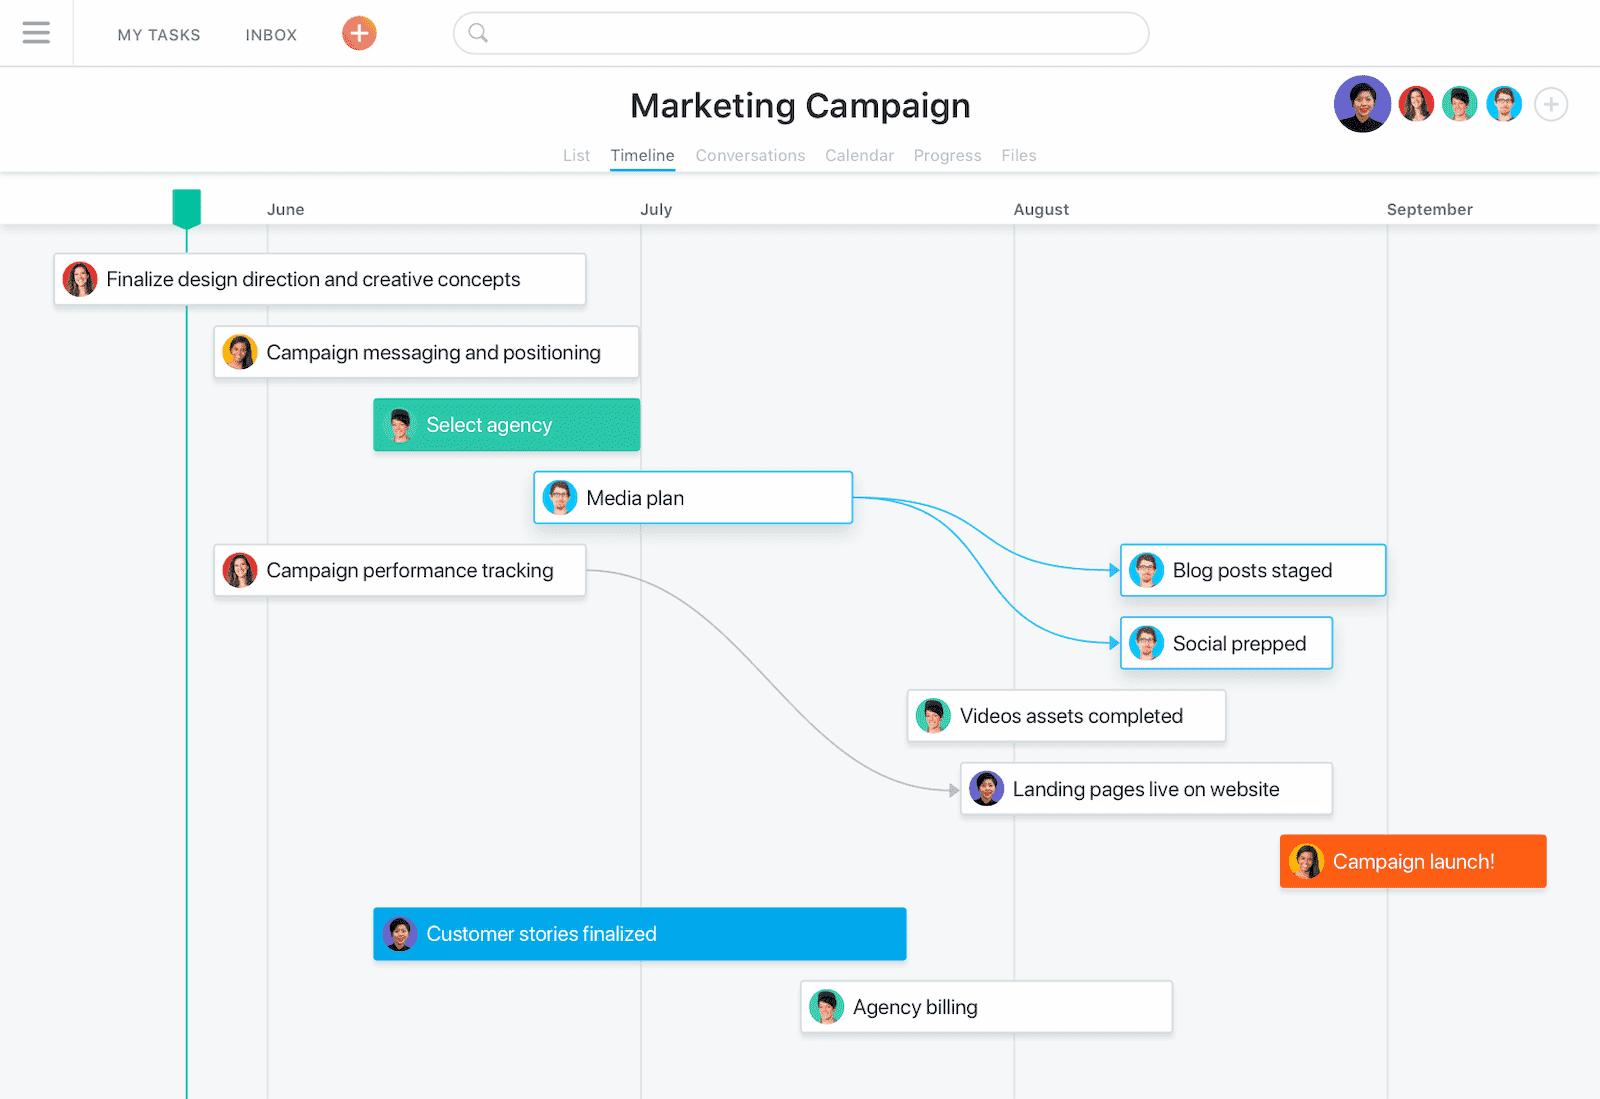 Project Management Skills - Using Gantt Charts